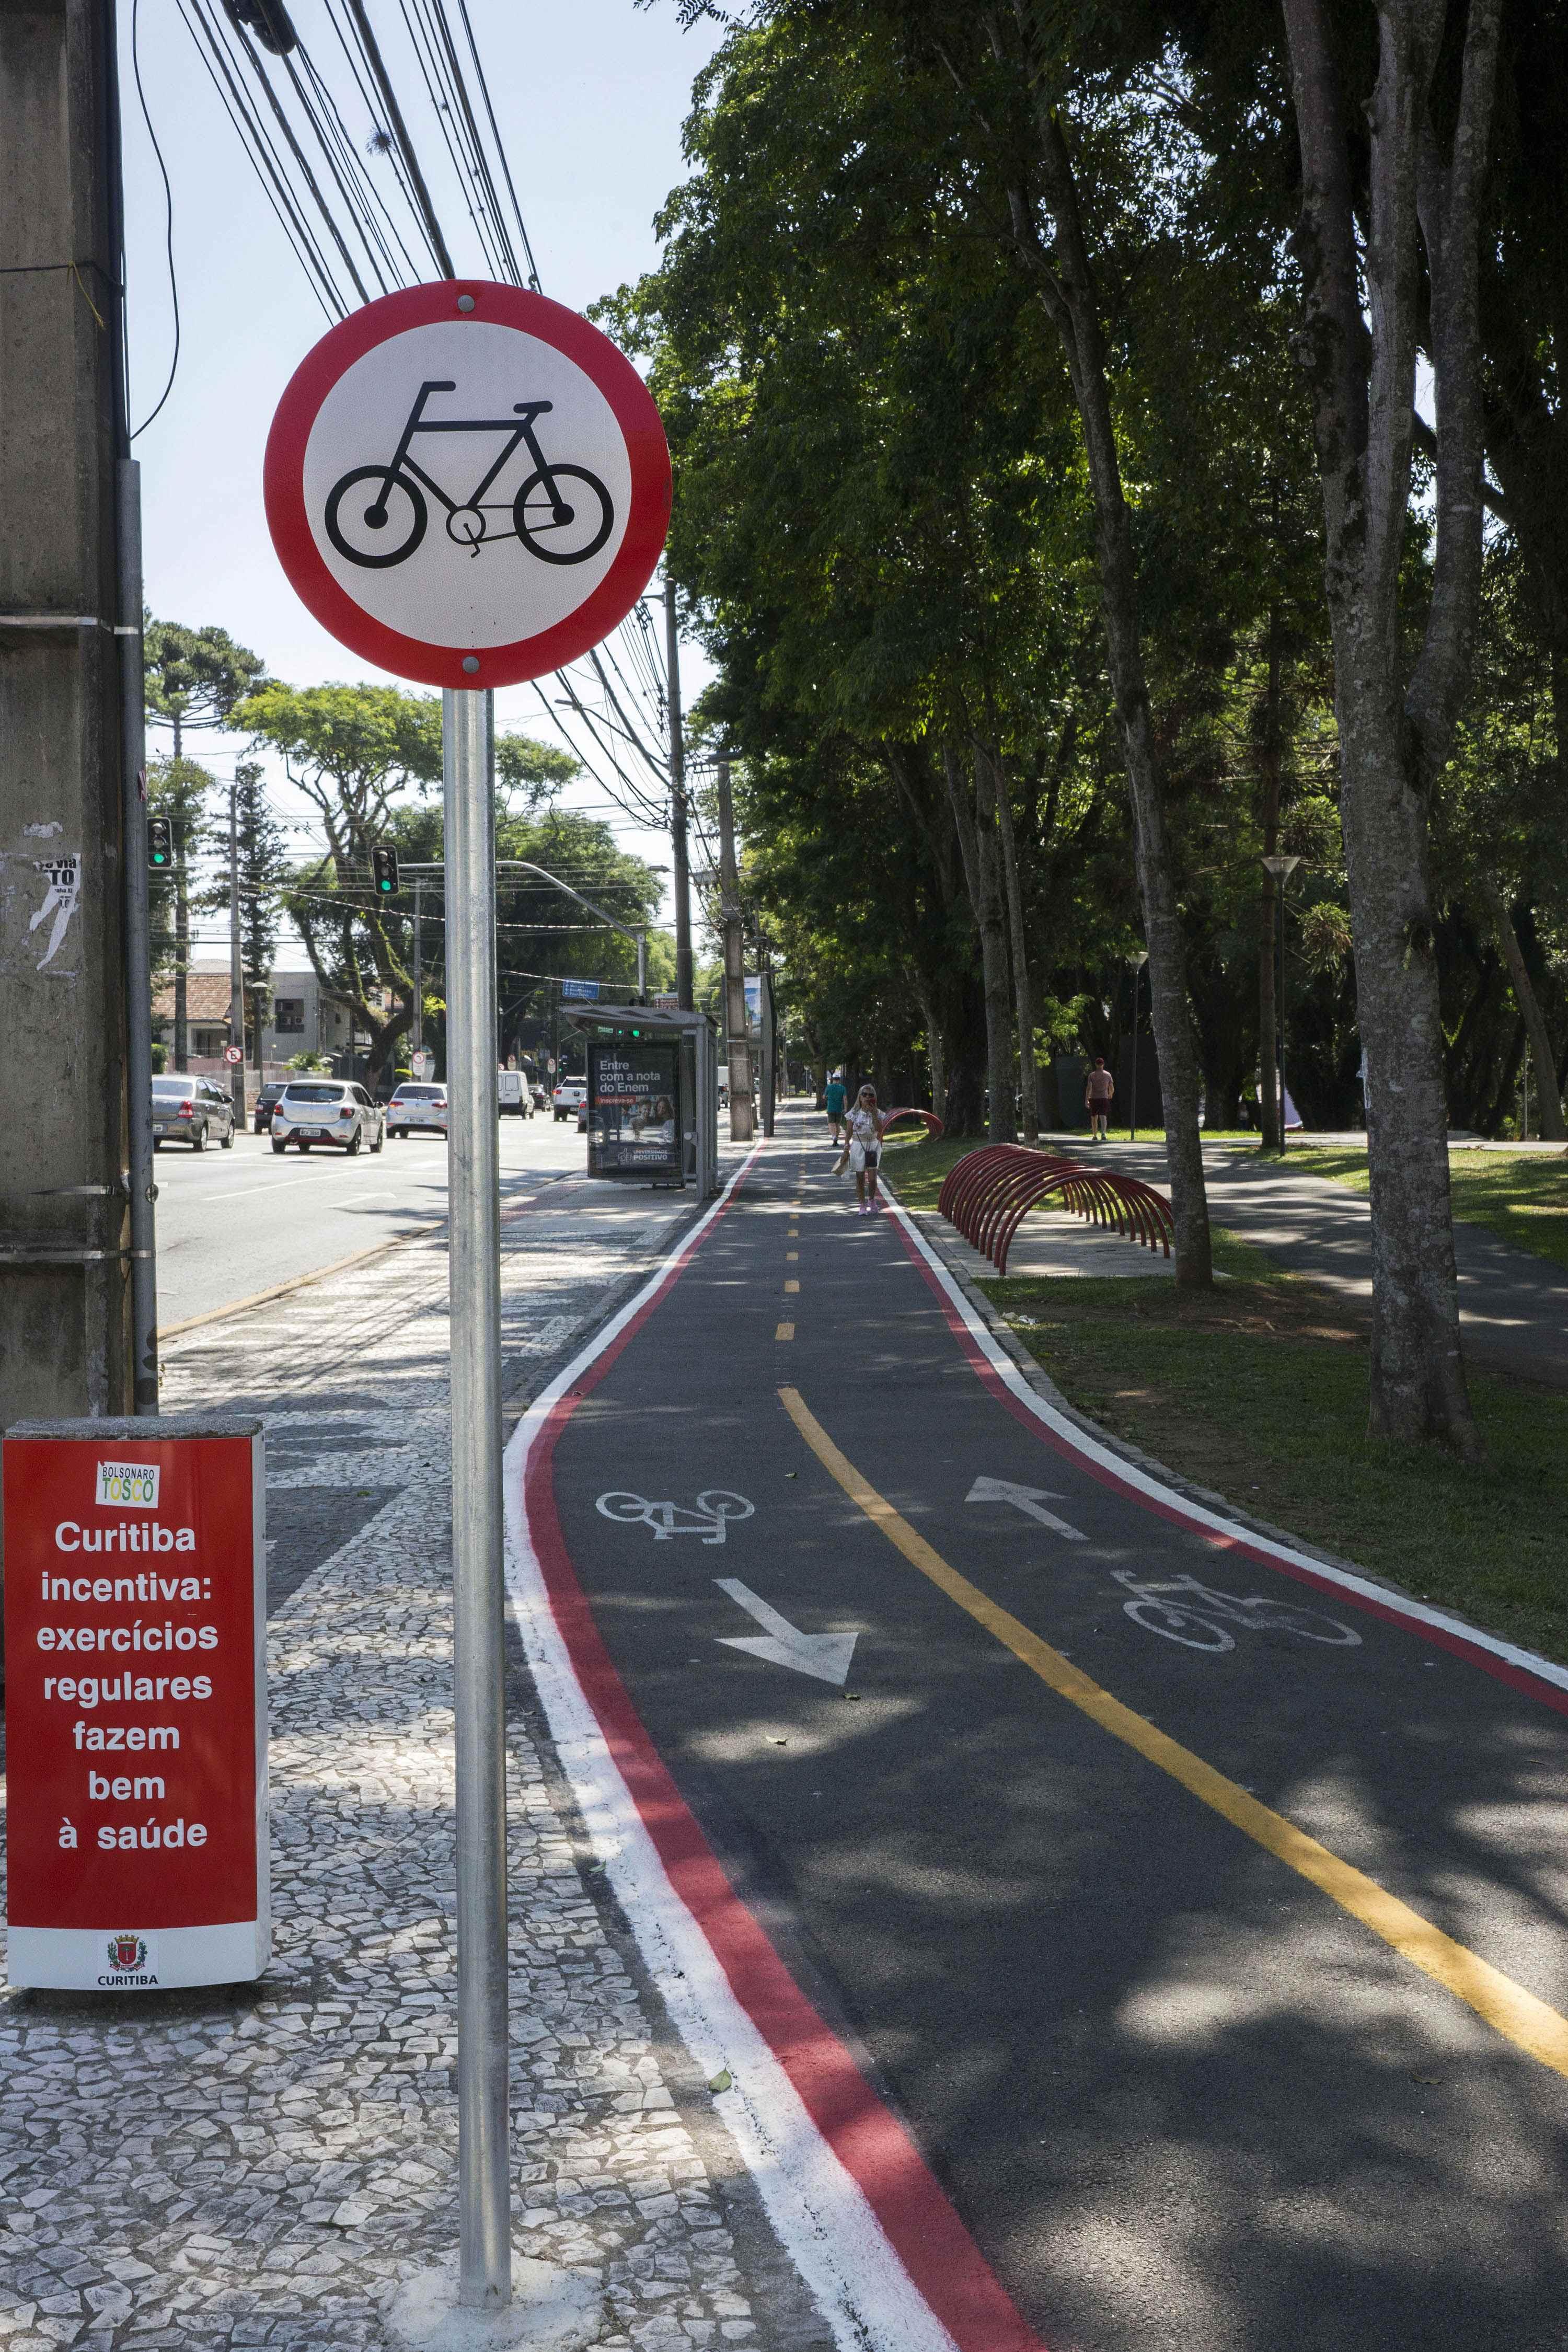 Avenida Getúlio Vargas tem estrutura cicloviária revitalizada. Curitiba, 28/01/2020. Foto: Valdecir Galor/SMCS